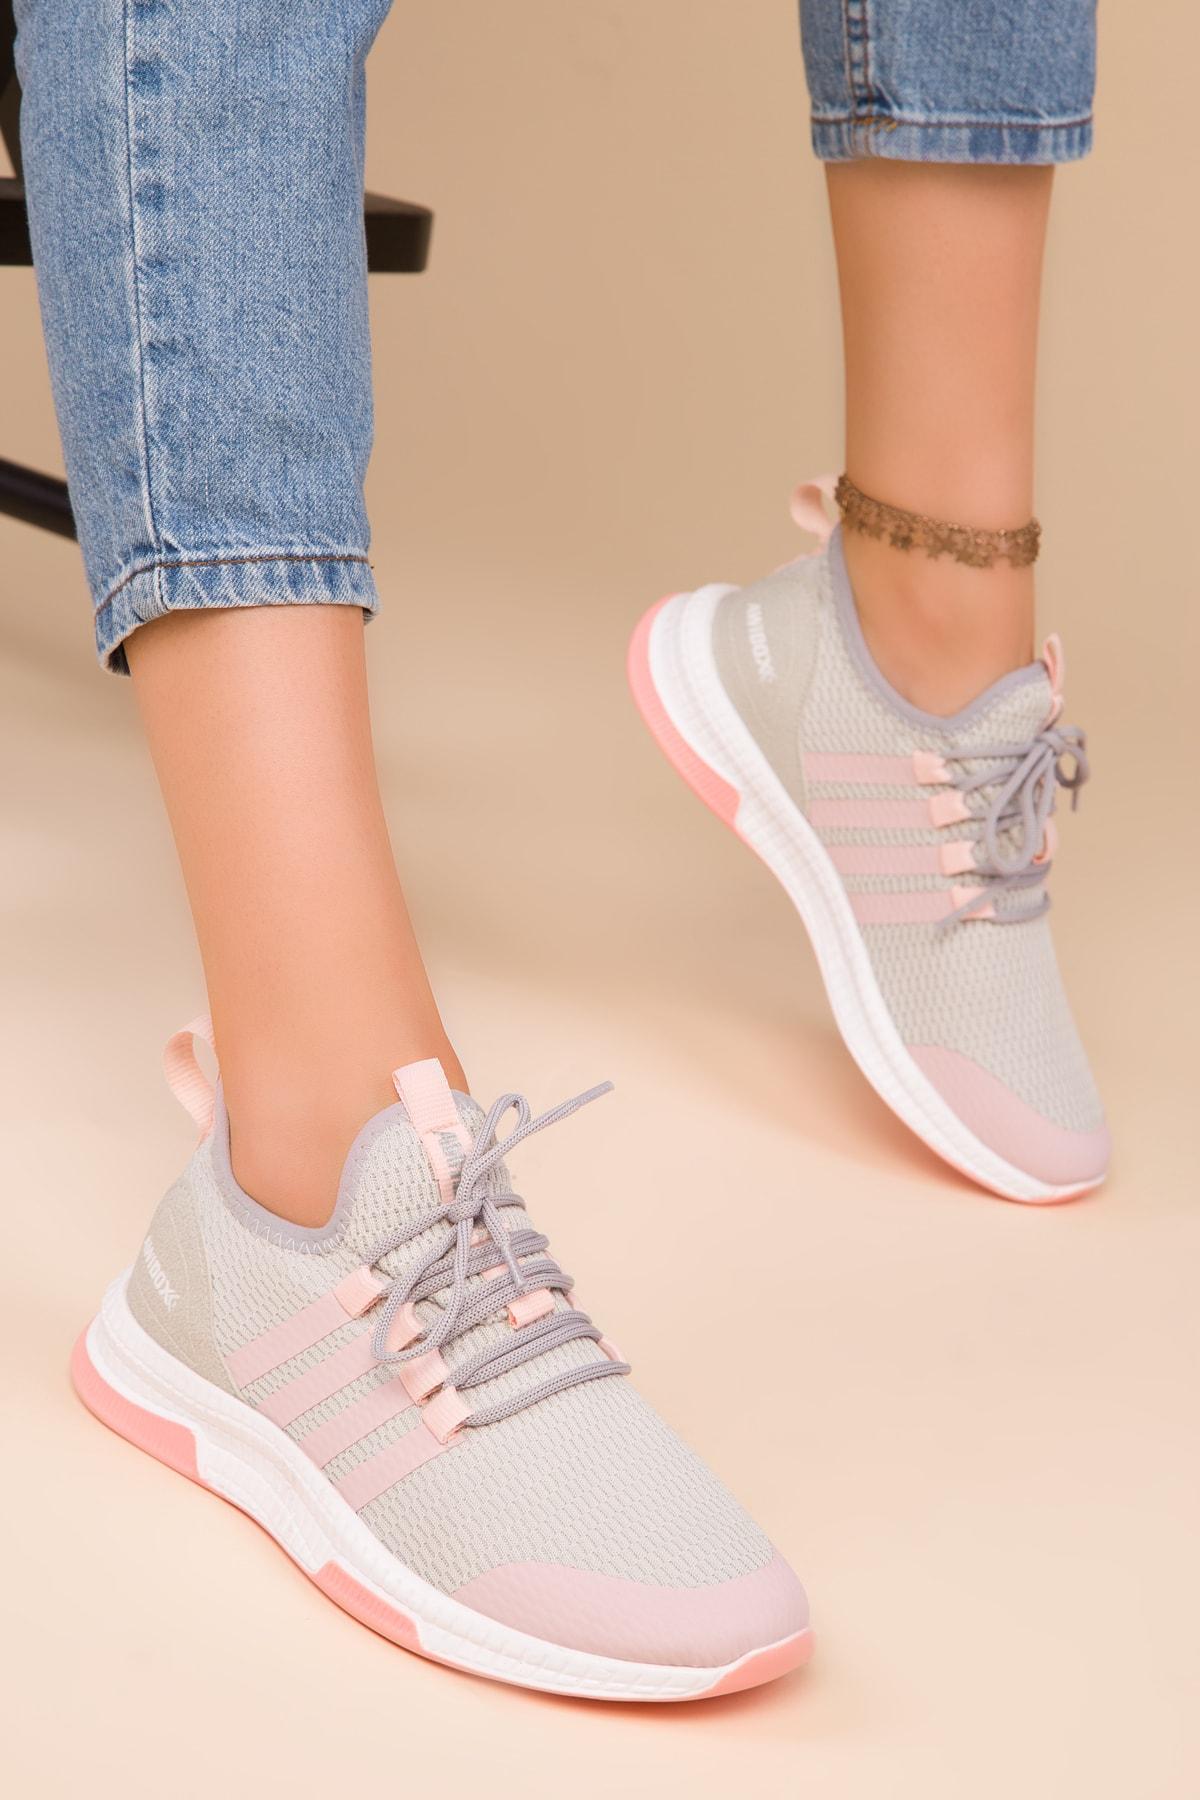 SOHO Buz-Pudra Kadın Sneaker 15195 2